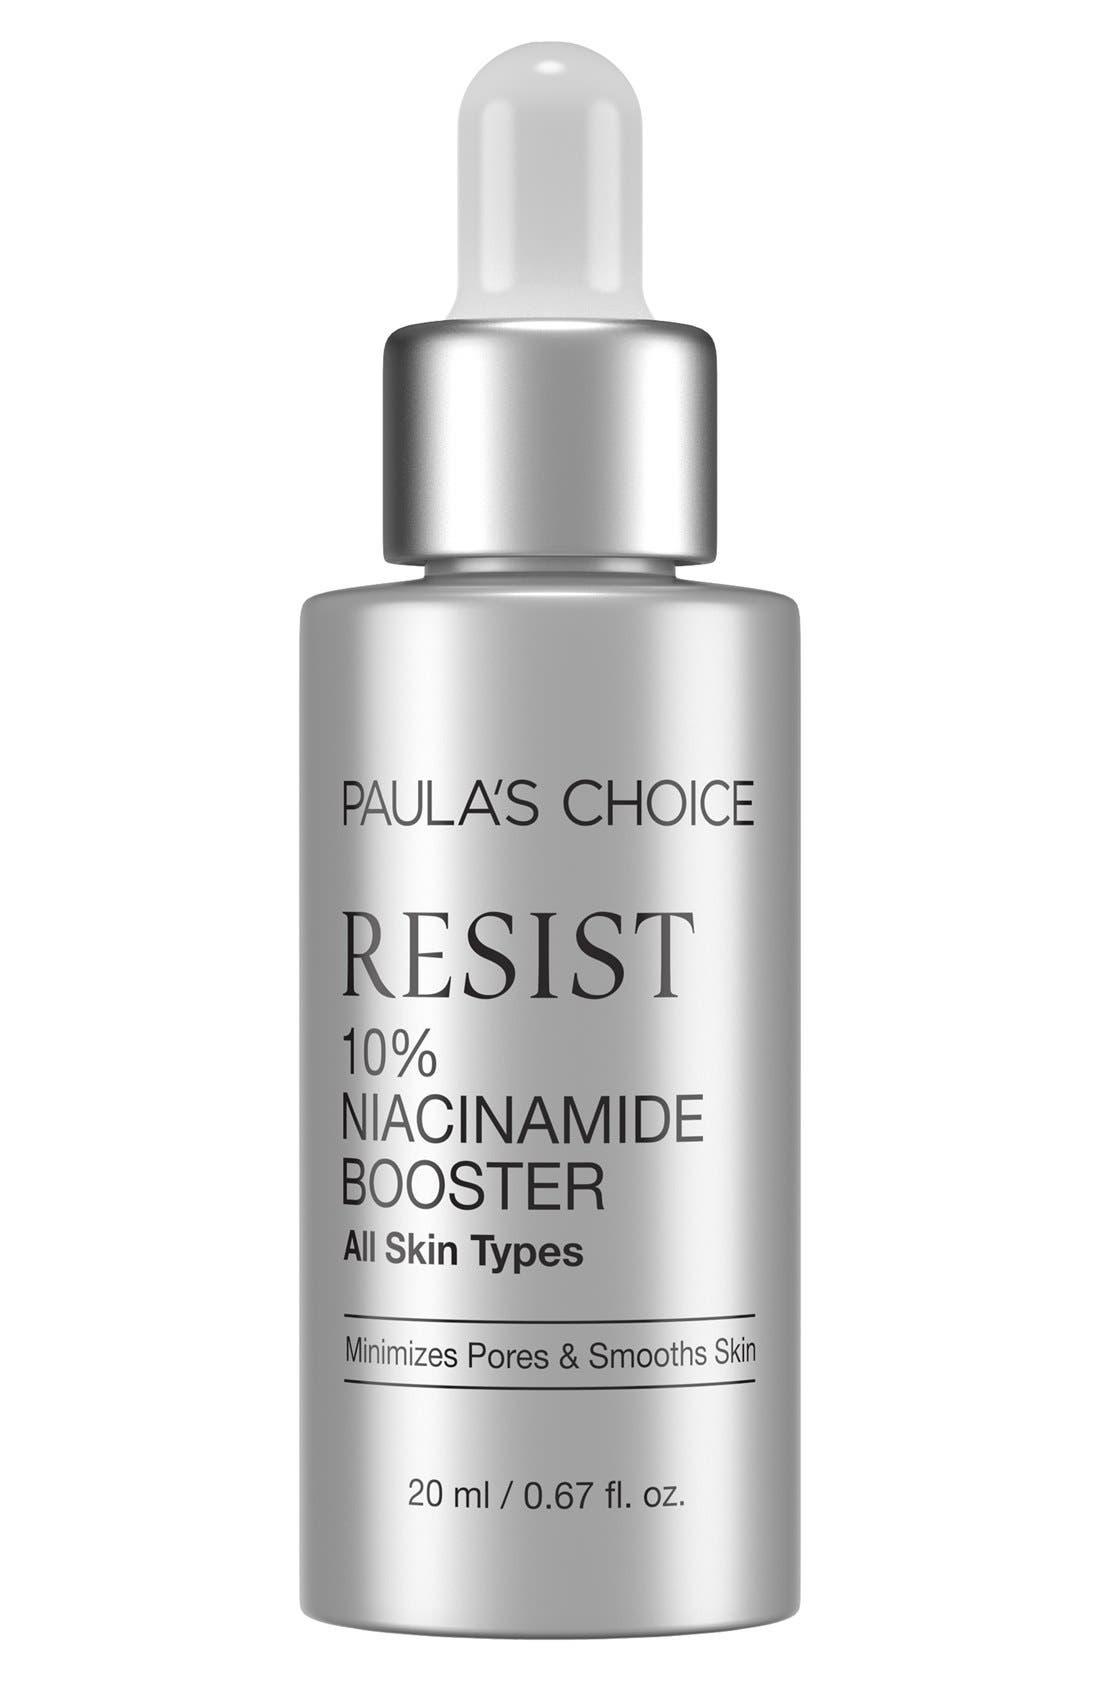 Resist 10% Niacinamide Booster,                             Main thumbnail 1, color,                             NO COLOR